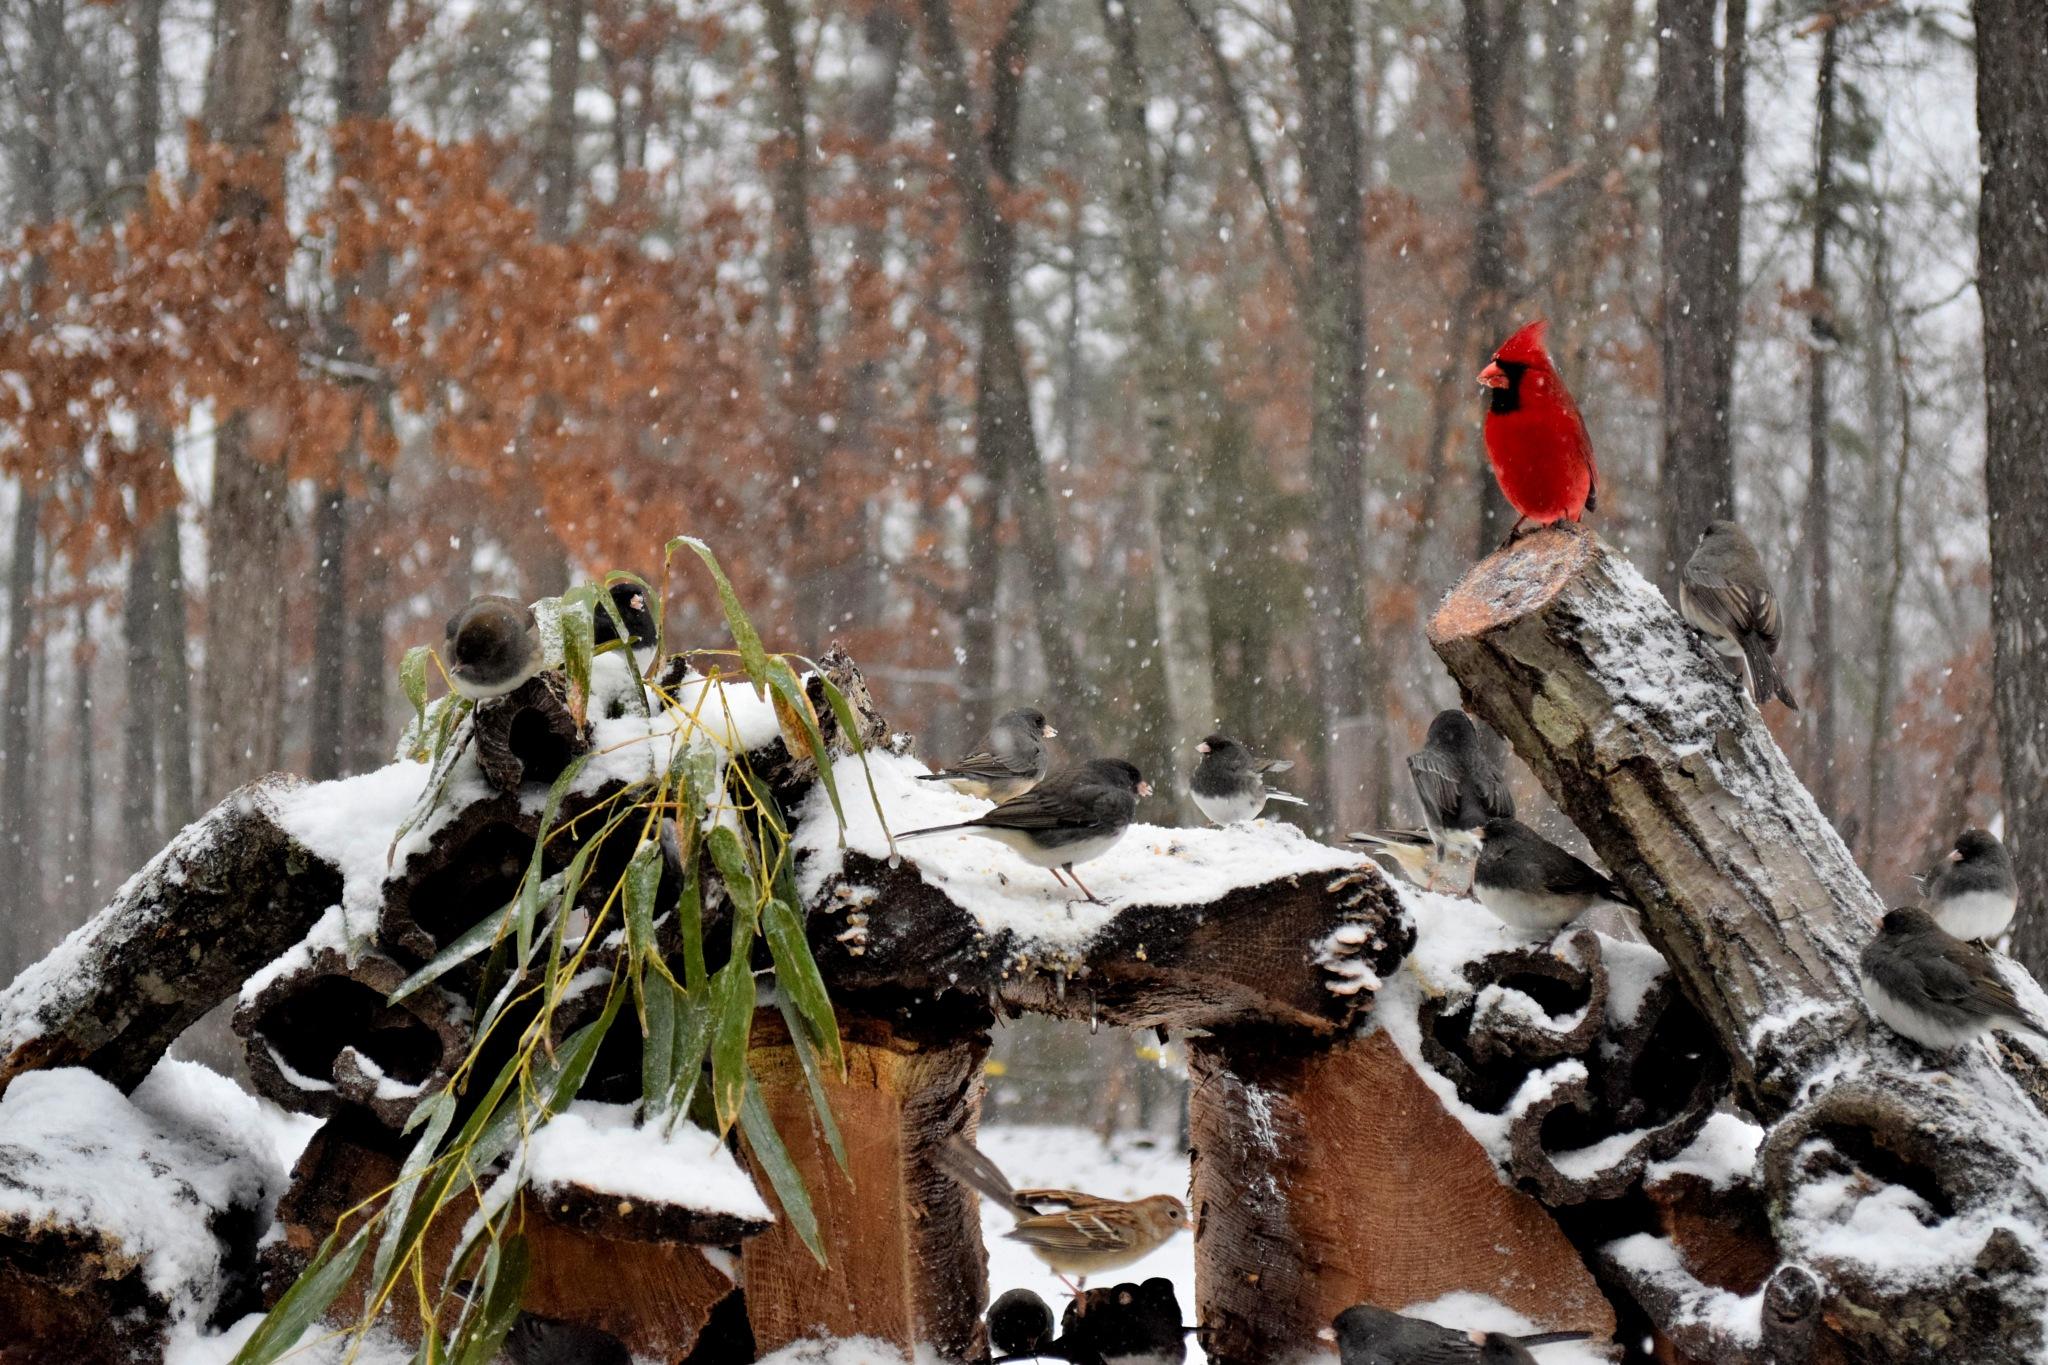 Nature's Birds 153~Snowy Days 3 by Lawrence Scott Hess